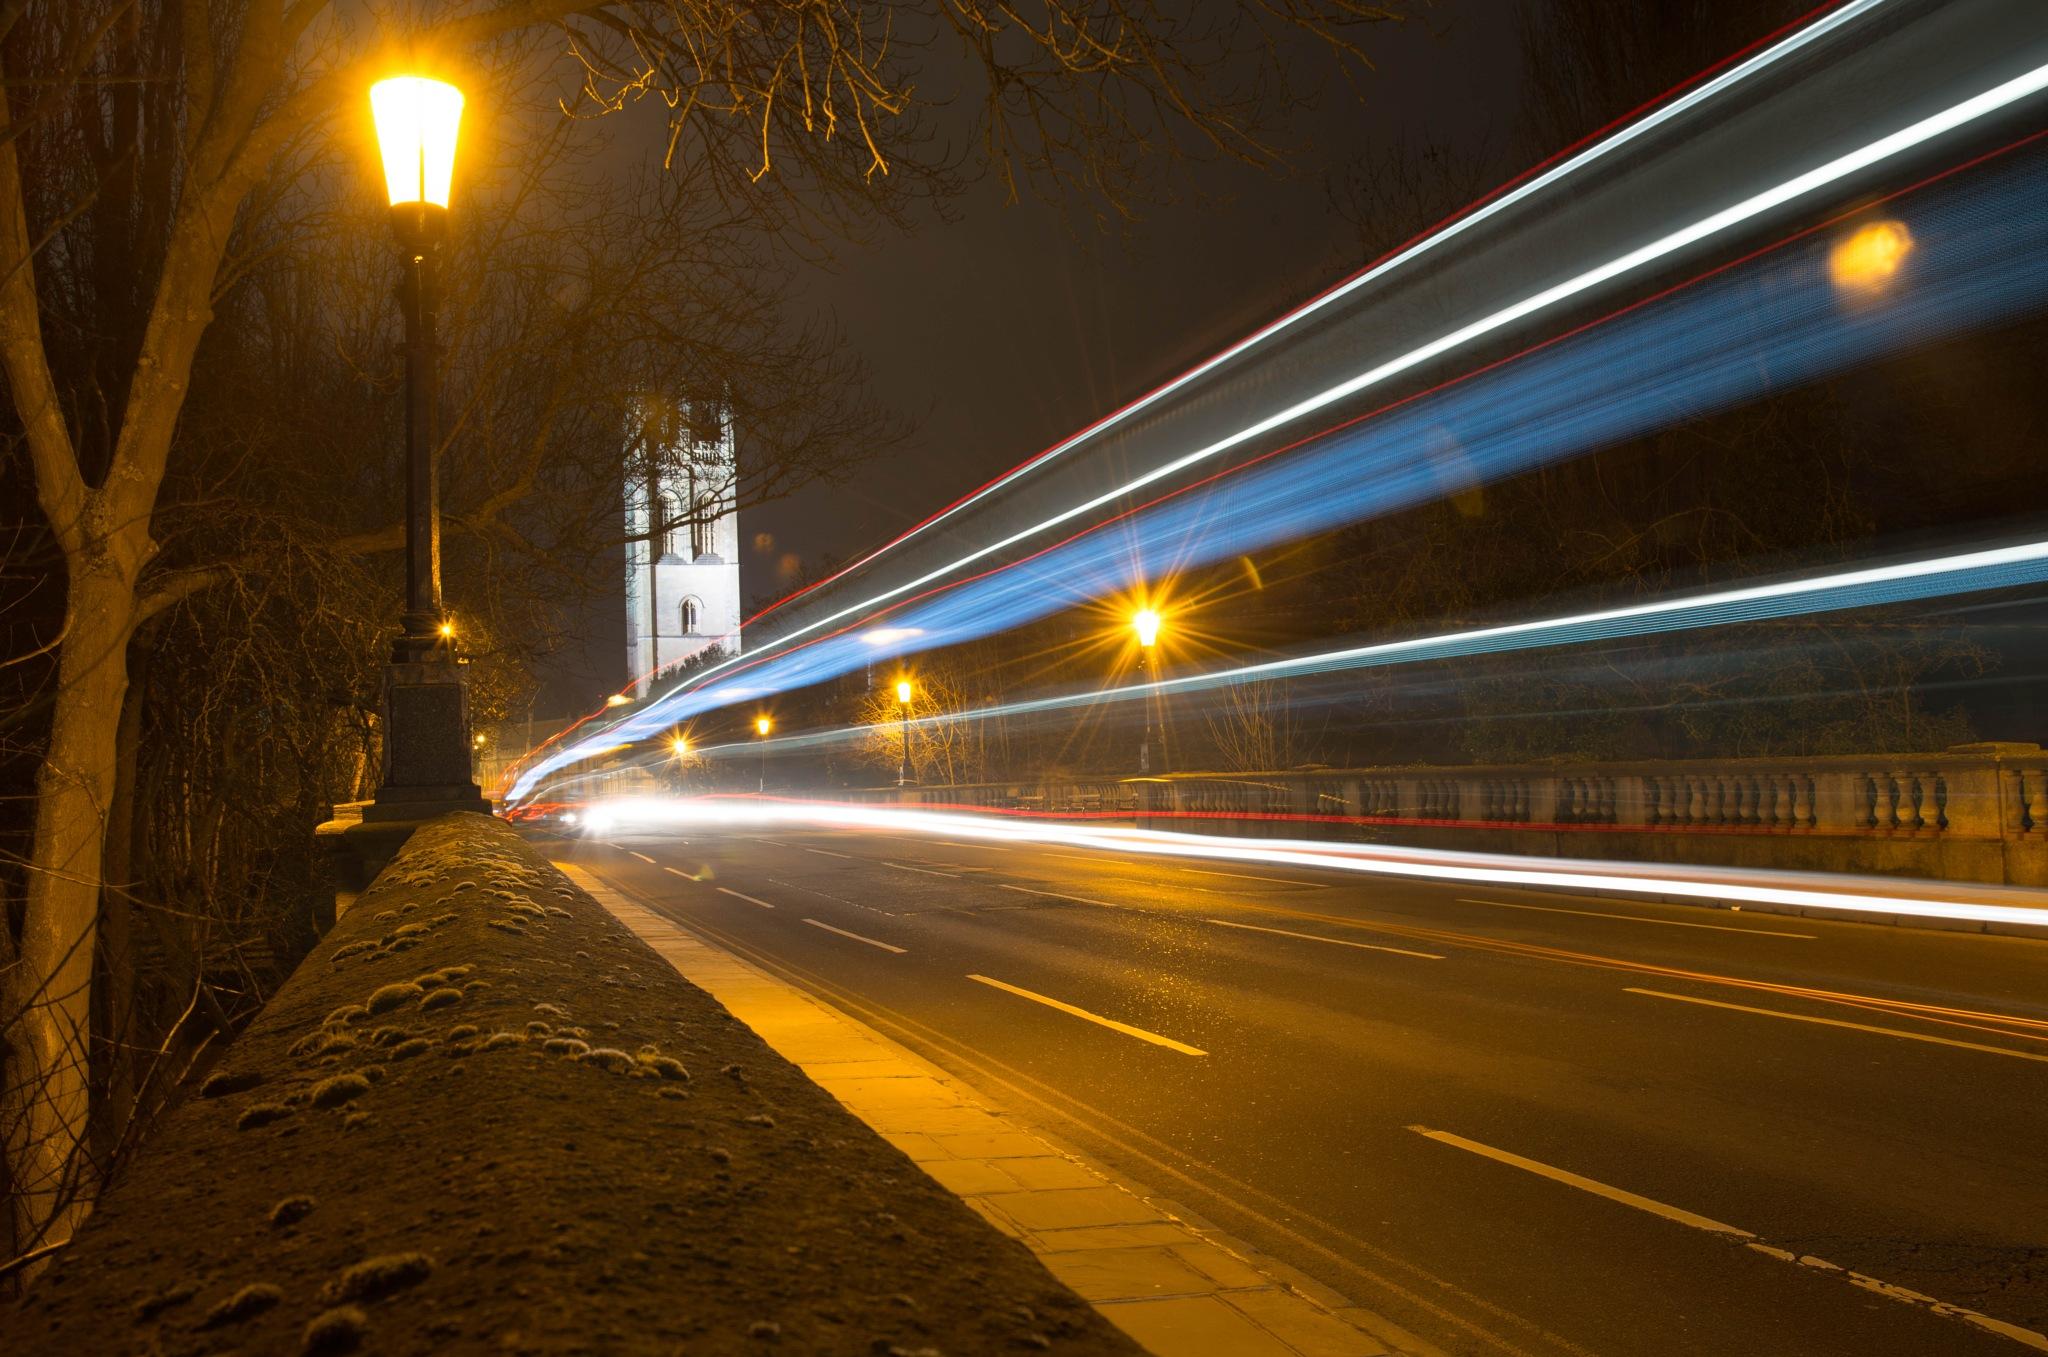 Oxford city by Tuca Iulian